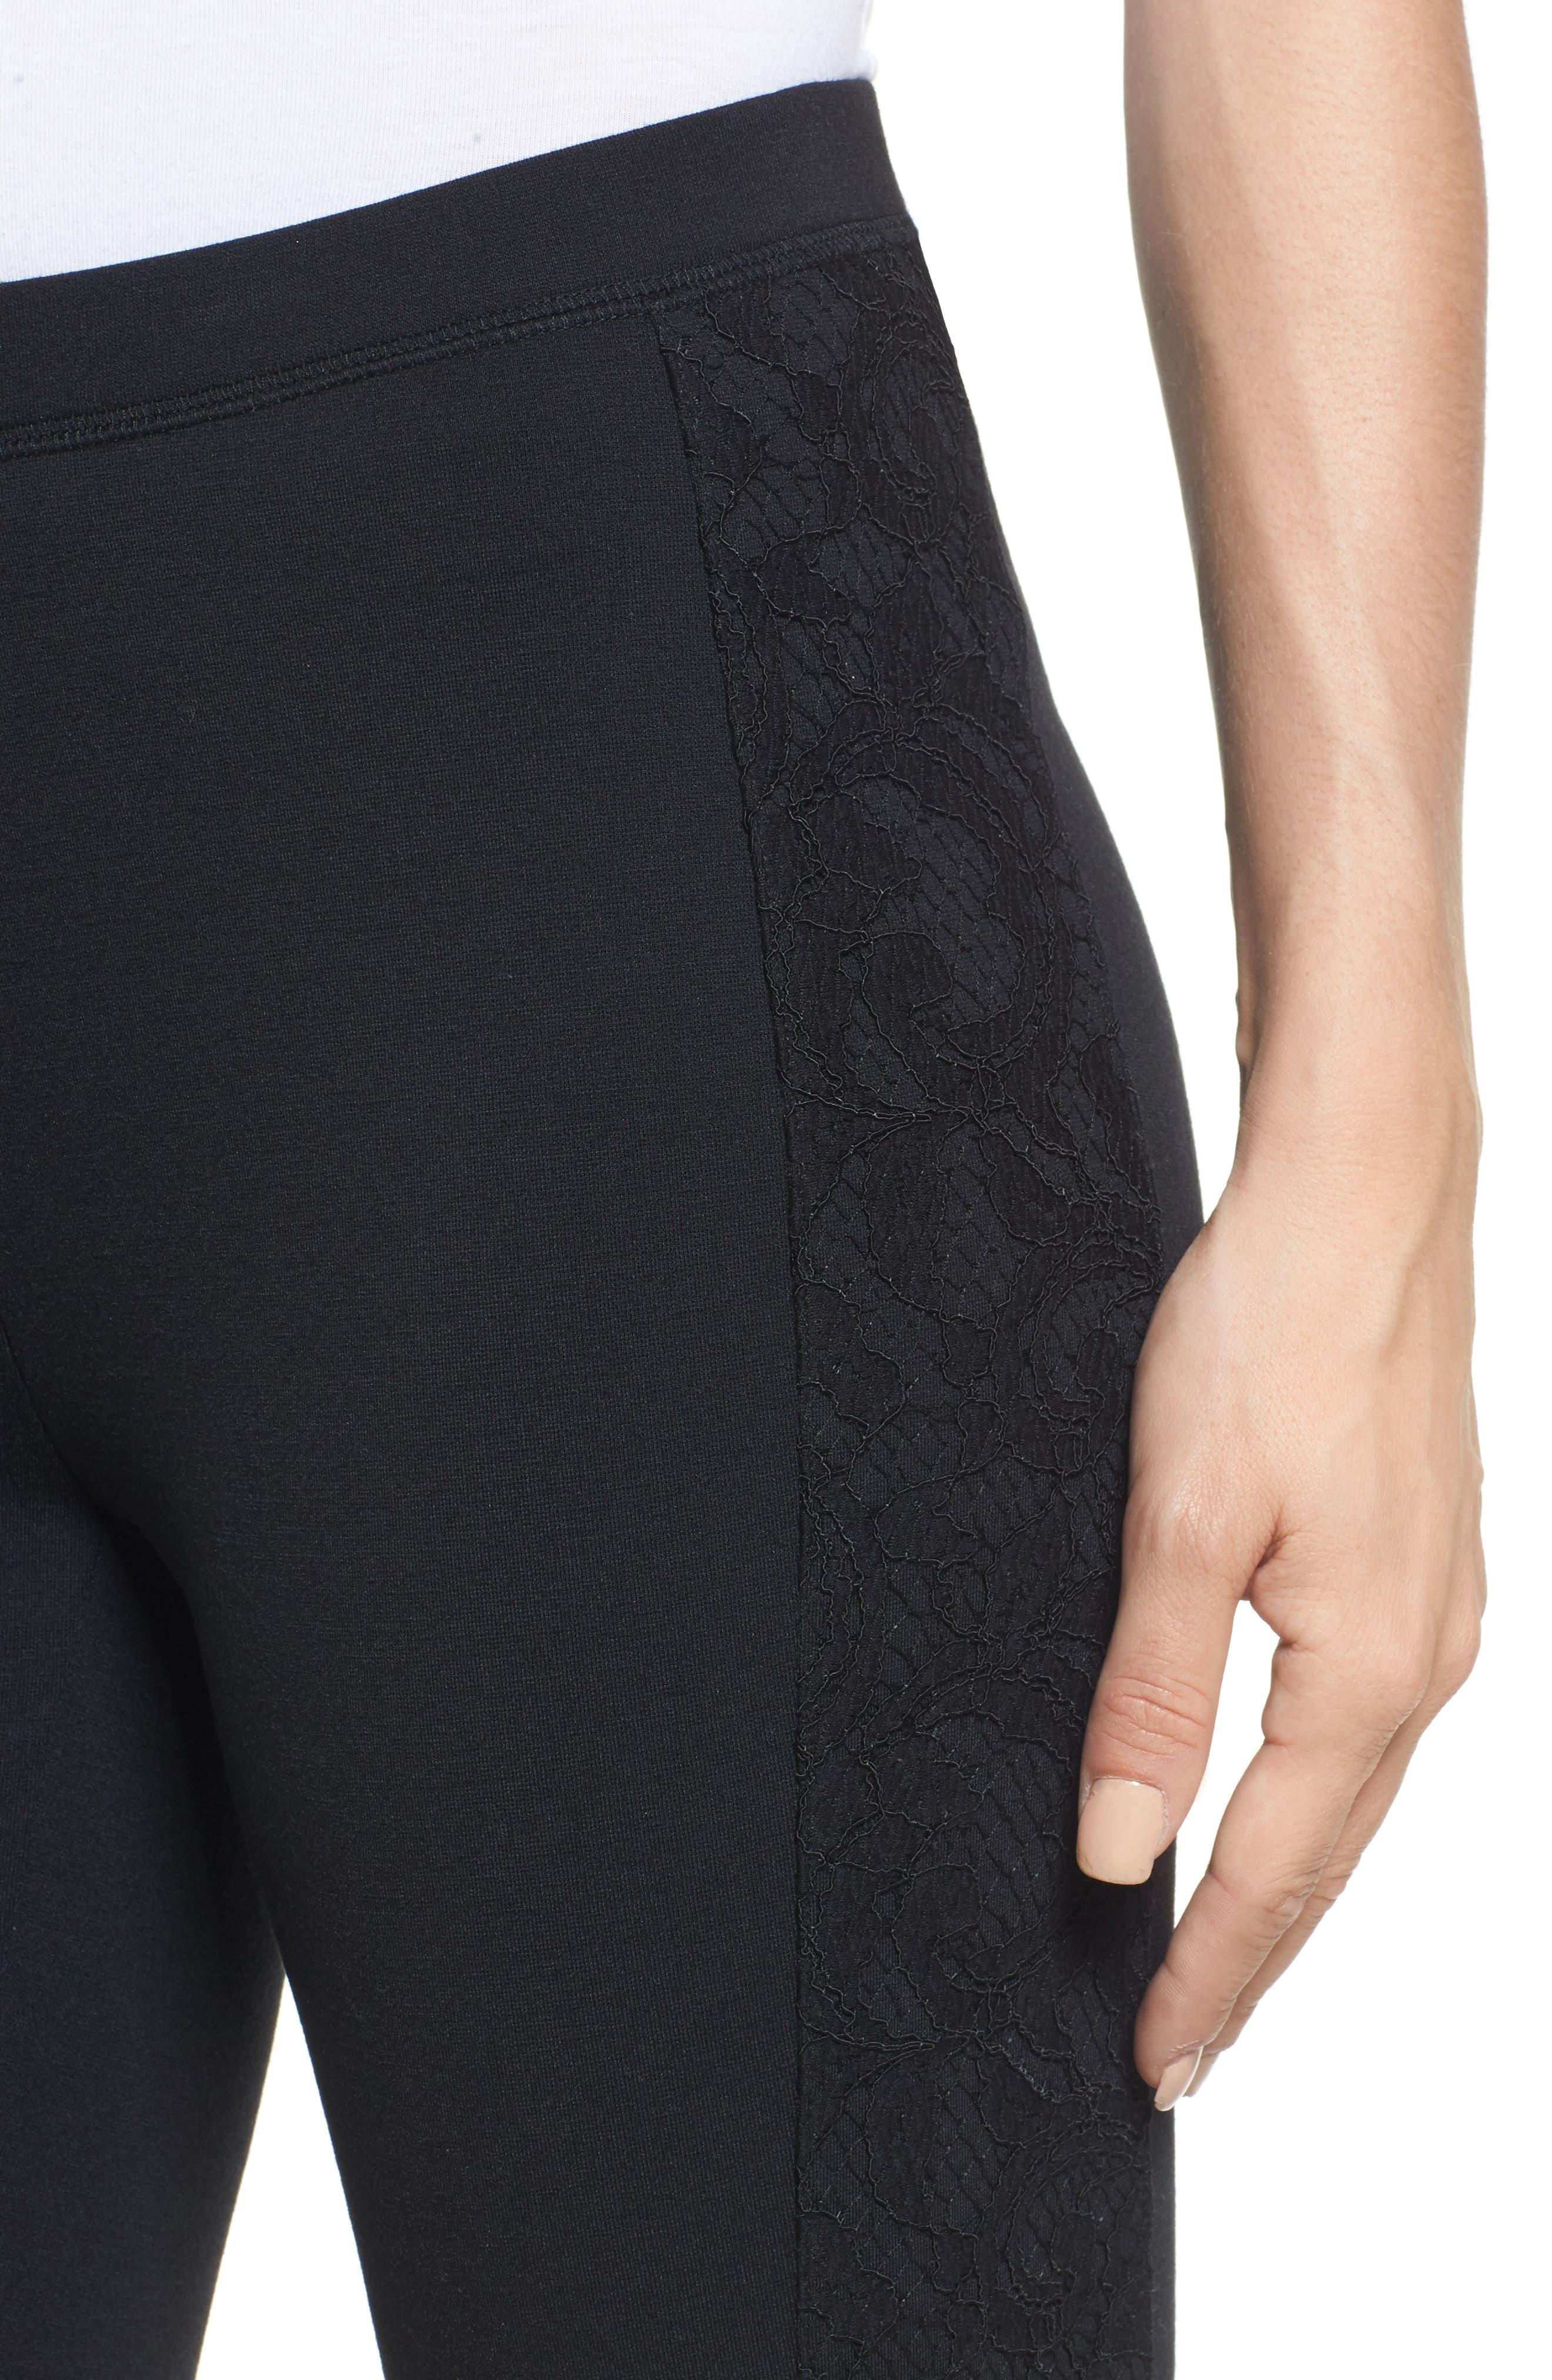 Lace Side Leggings,                             Alternate thumbnail 4, color,                             Black